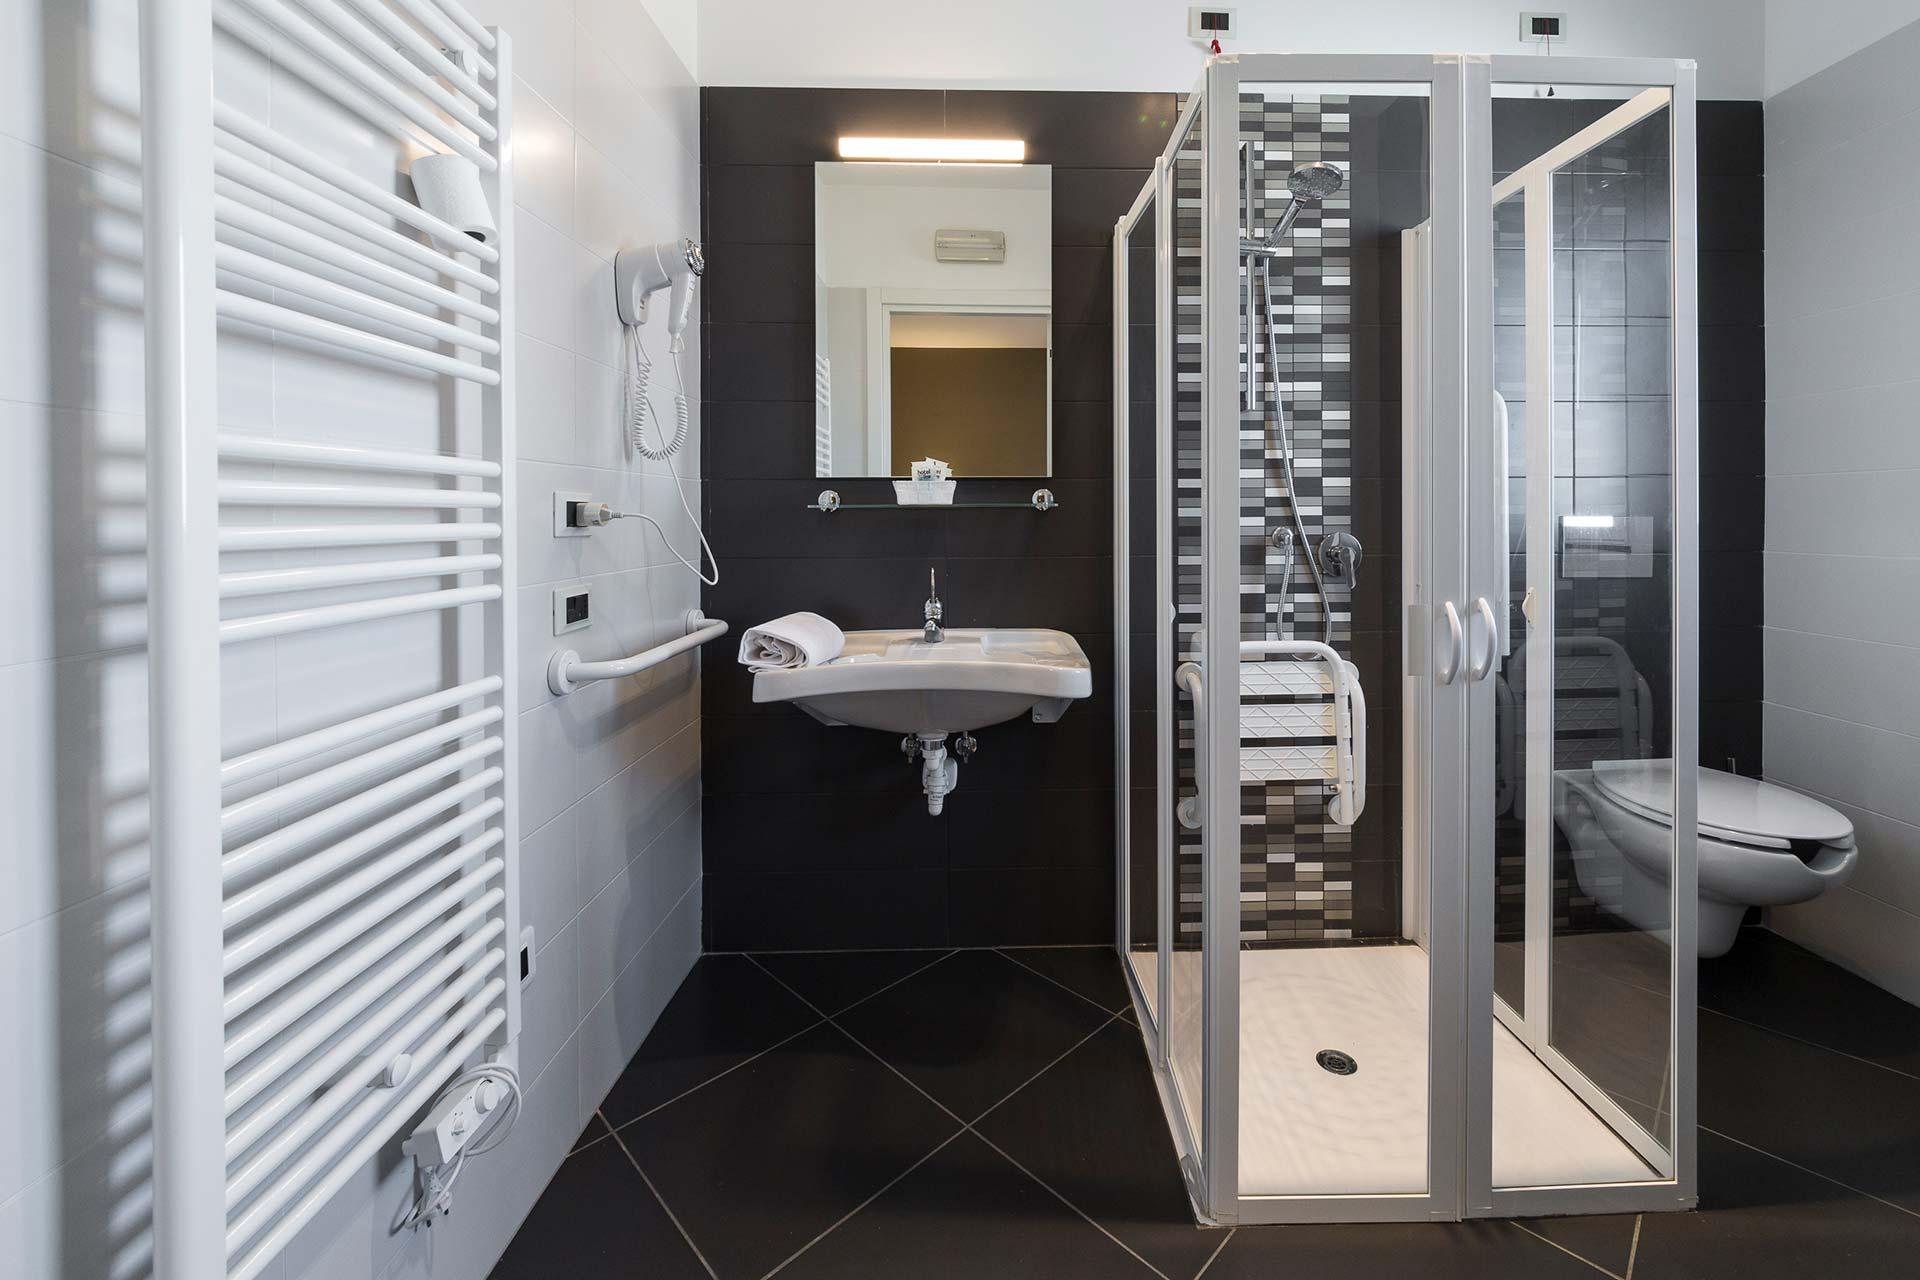 Hotel_Mediterraneo_Accessibilita